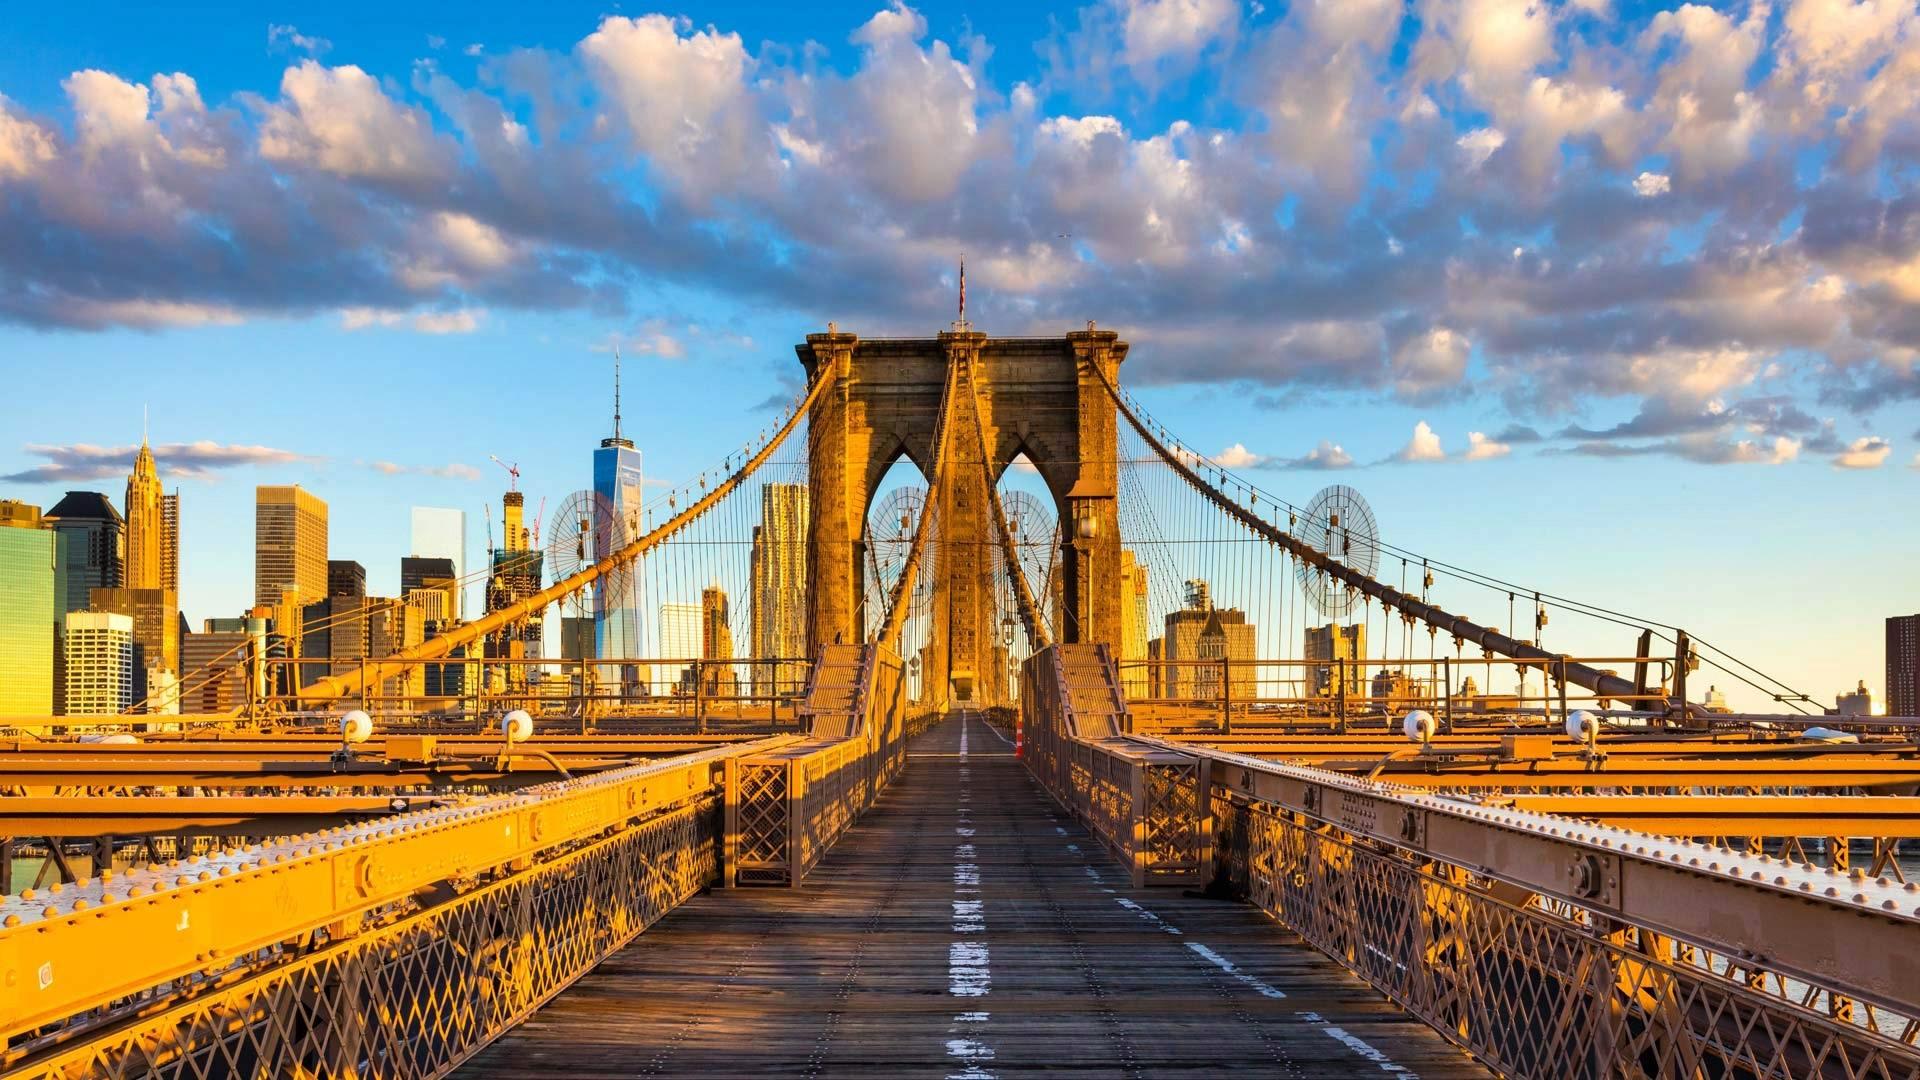 new, york, brooklyn, bridge, usa онлайн